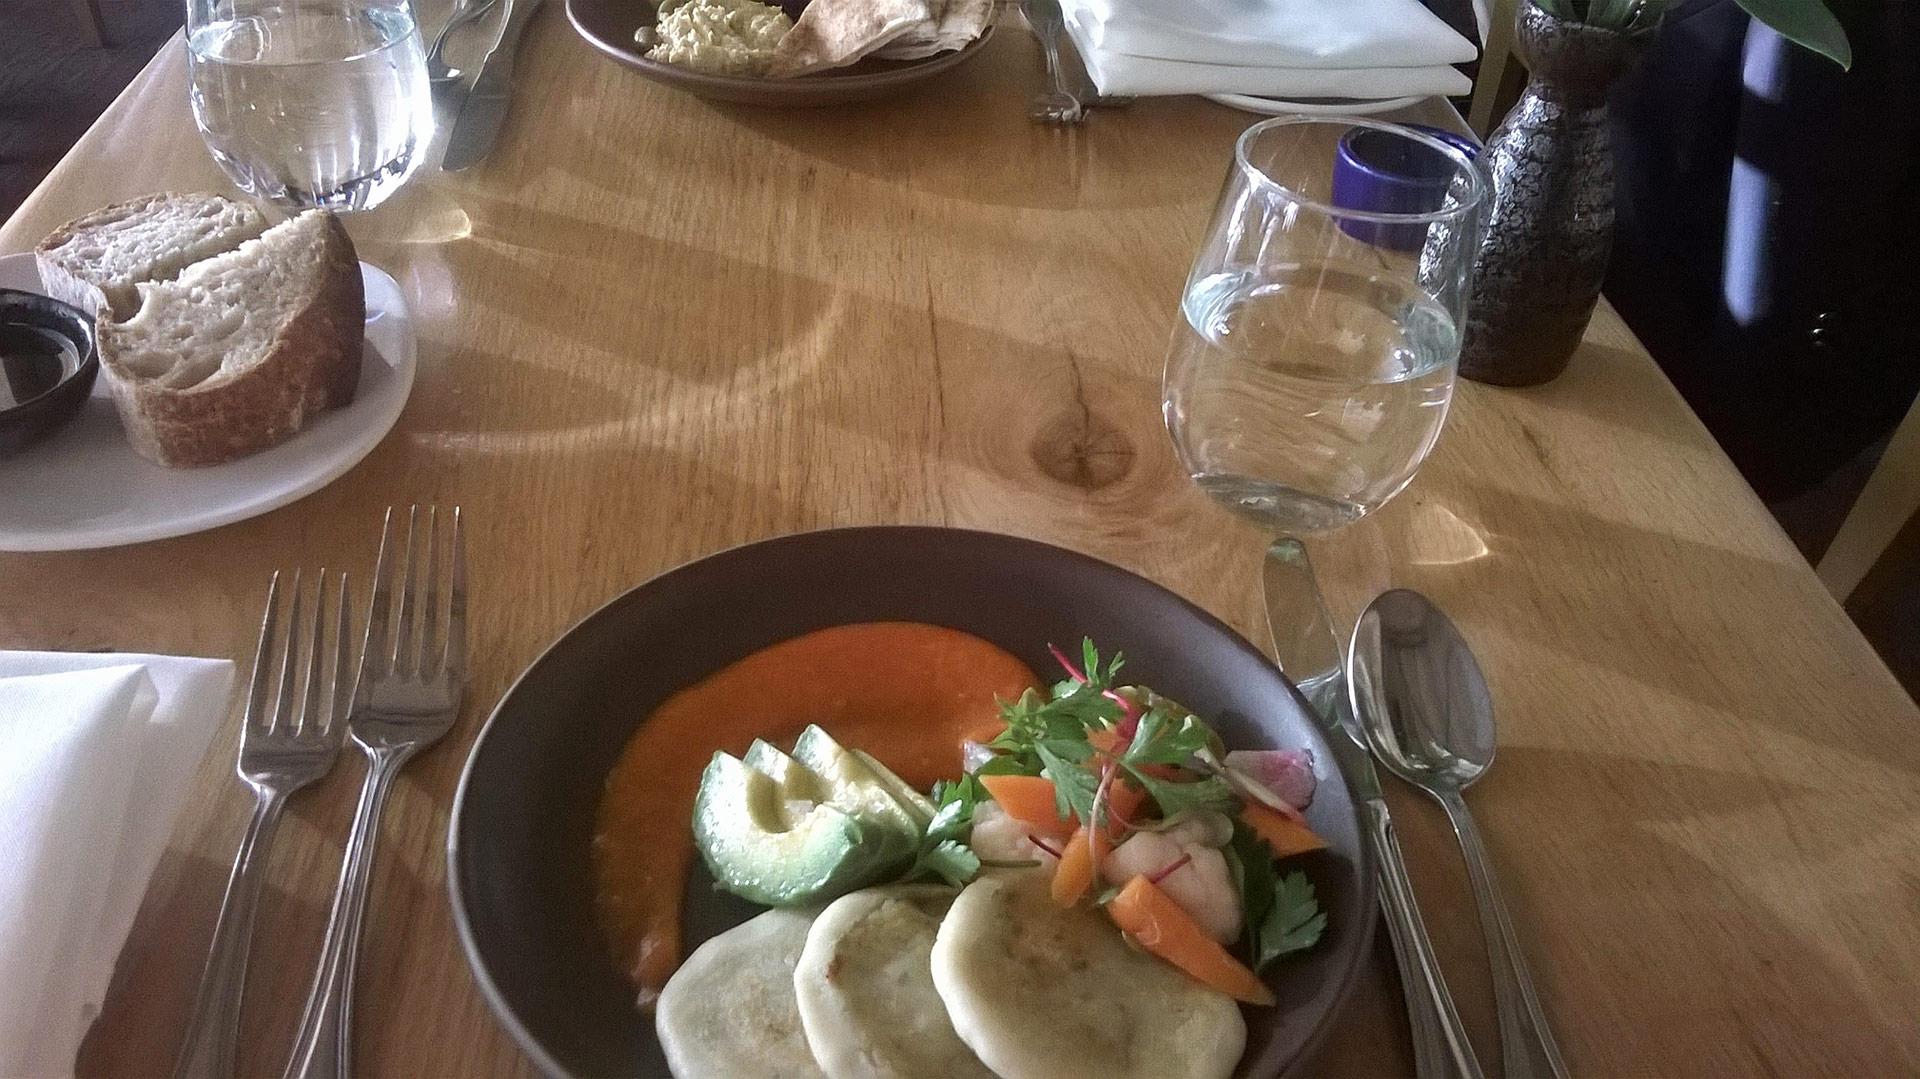 Greens Restaurant Marinassa. Kuva: Reetta Kemppi